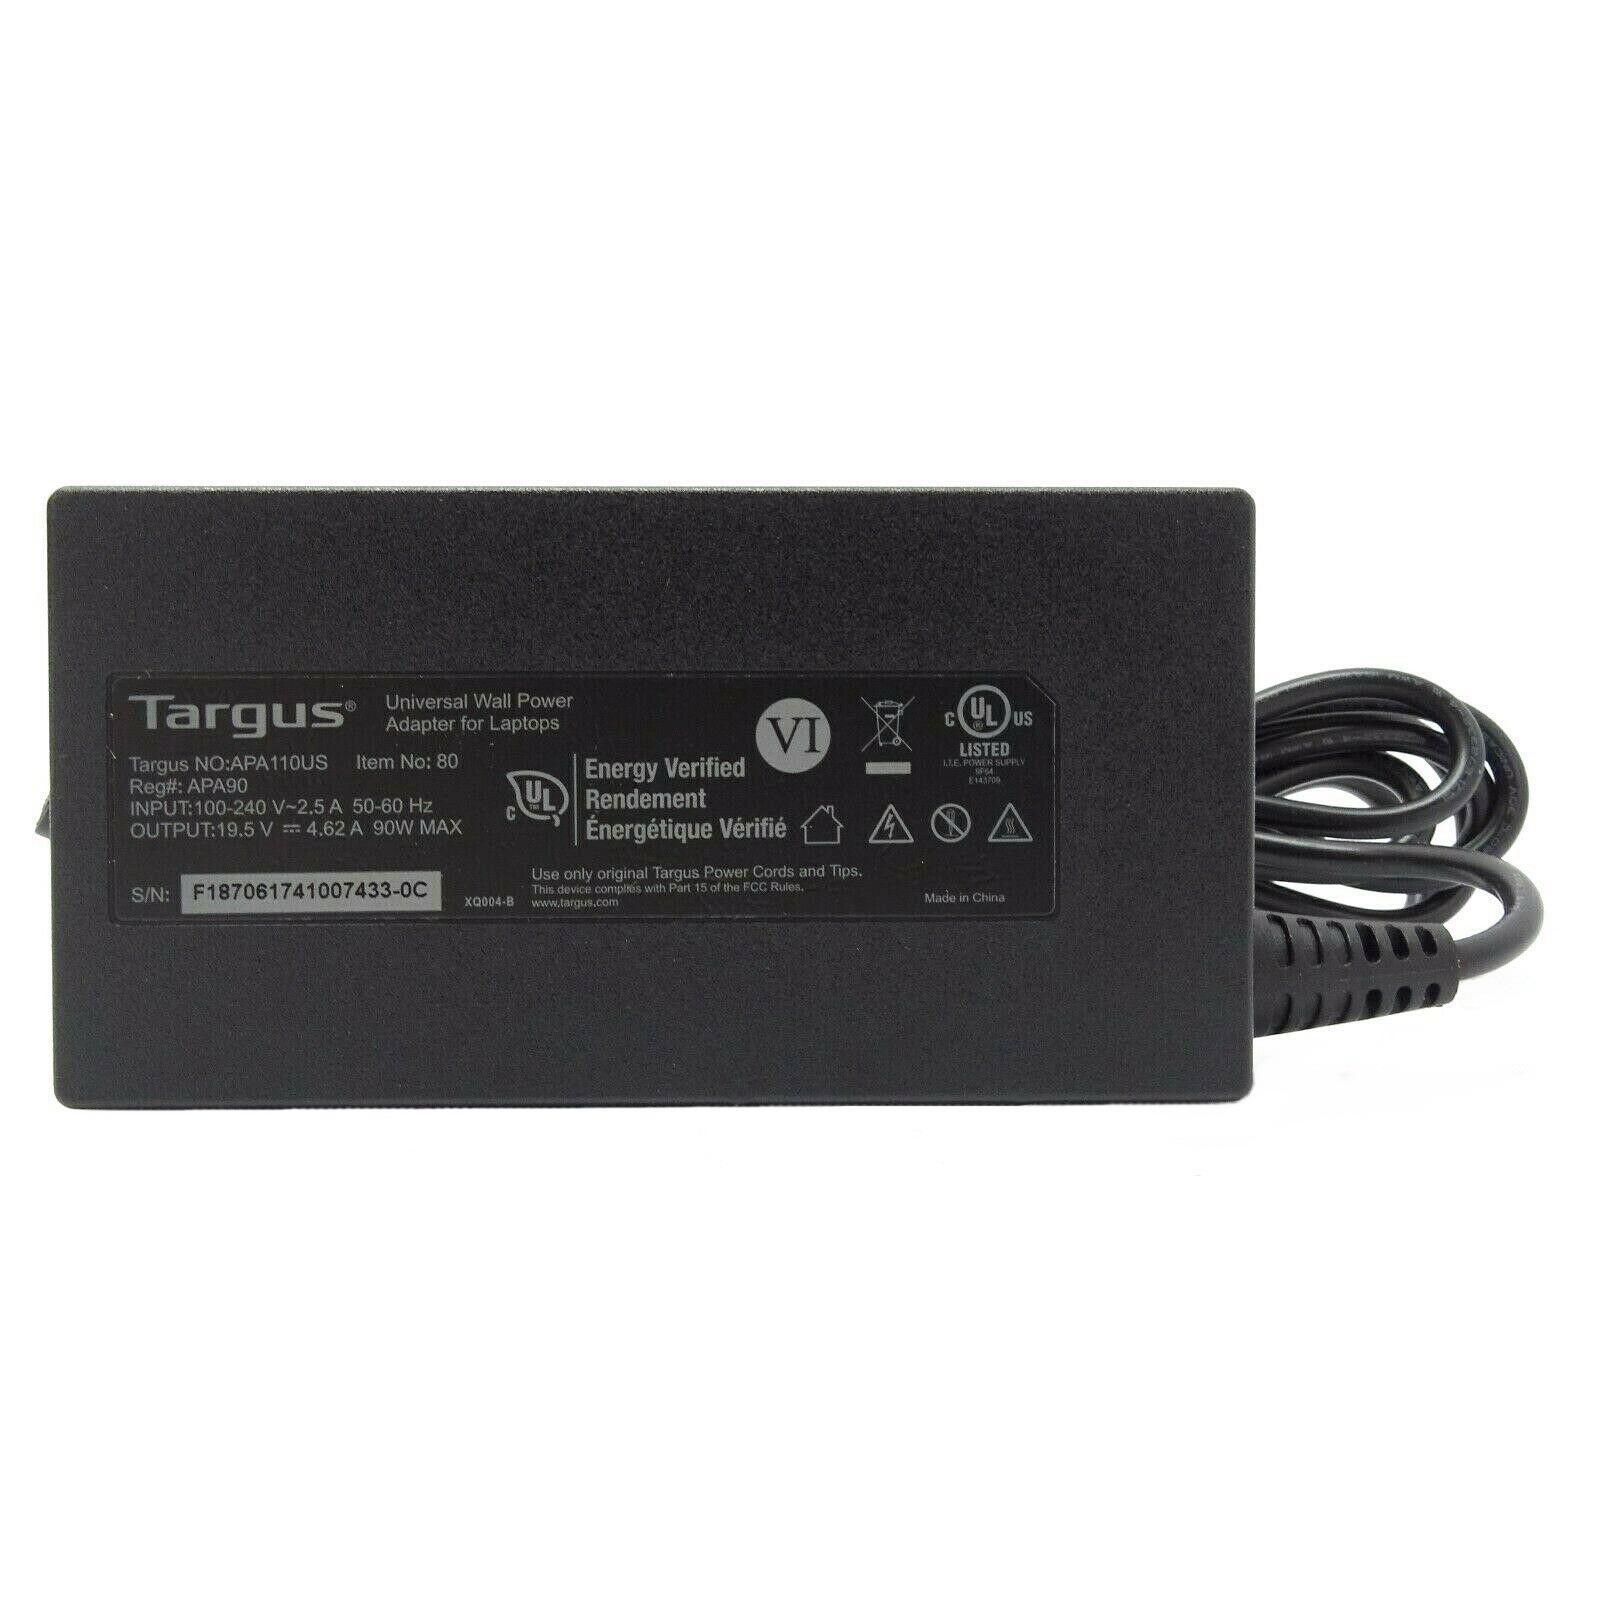 شارژر لپ تاپ 19.5 ولت 4.62 آمپر تارگوس مدل APA110US